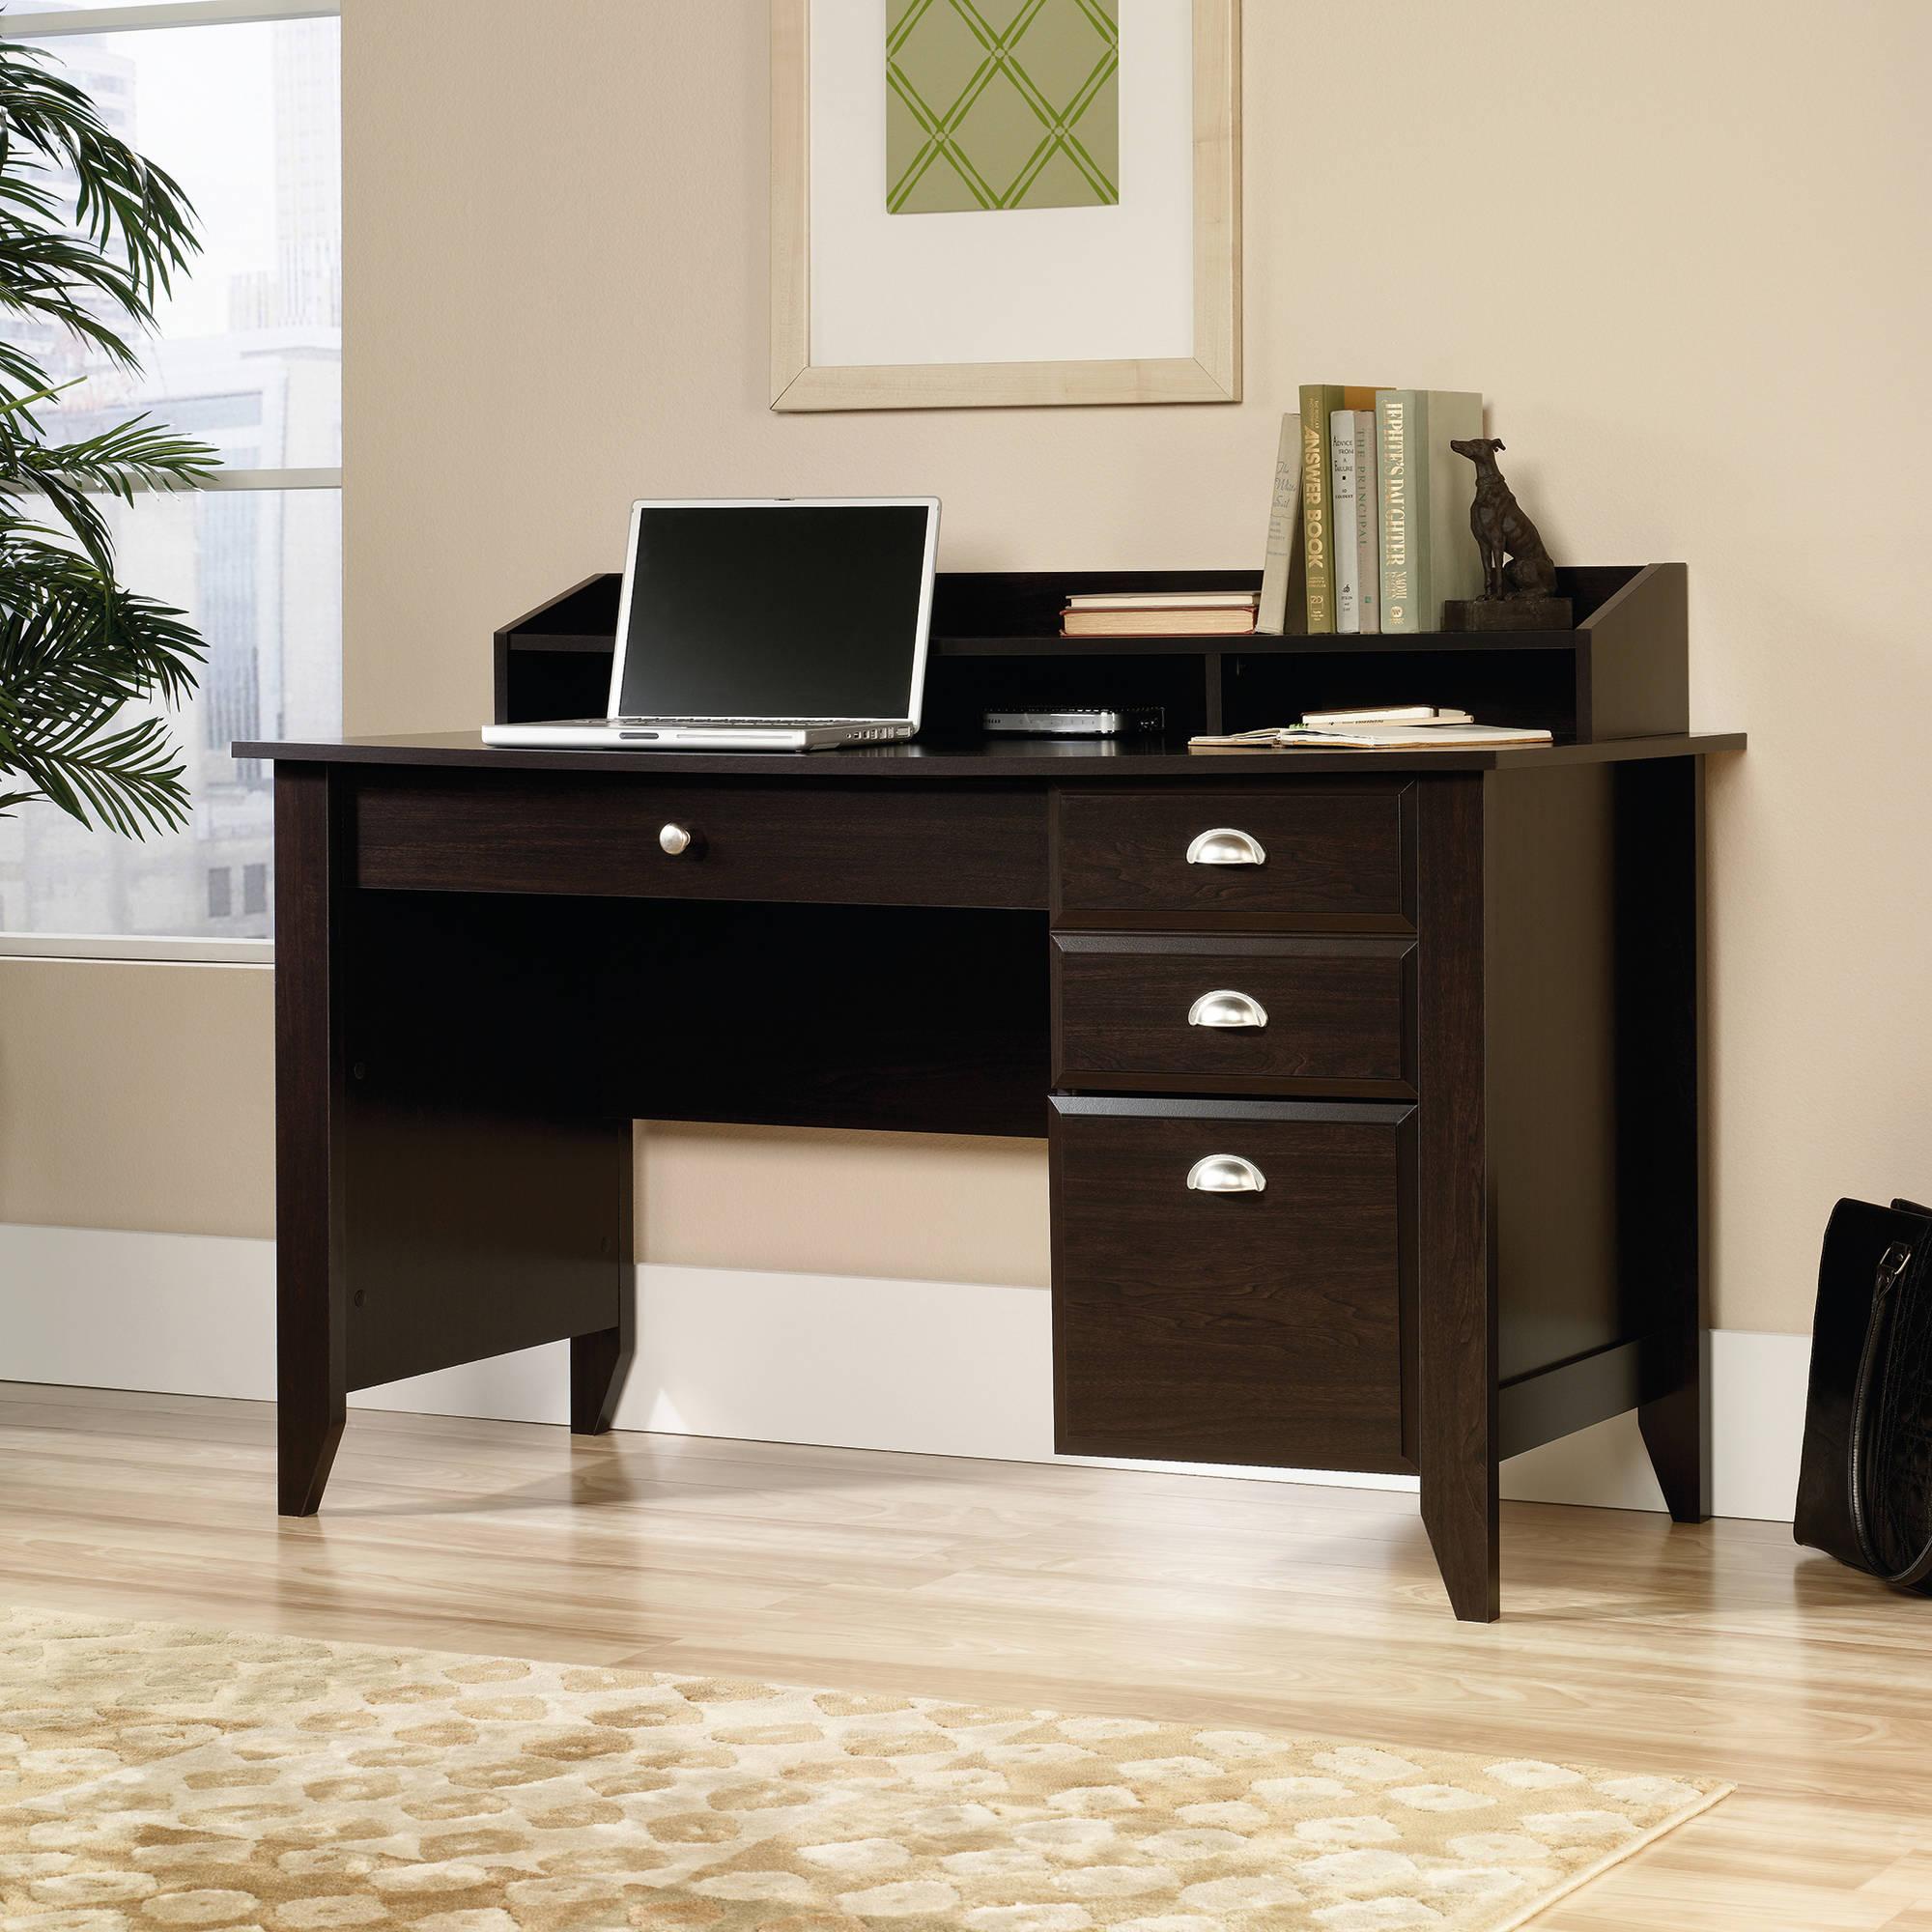 Sauder Shoal Creek Desk, Multiple Finishes